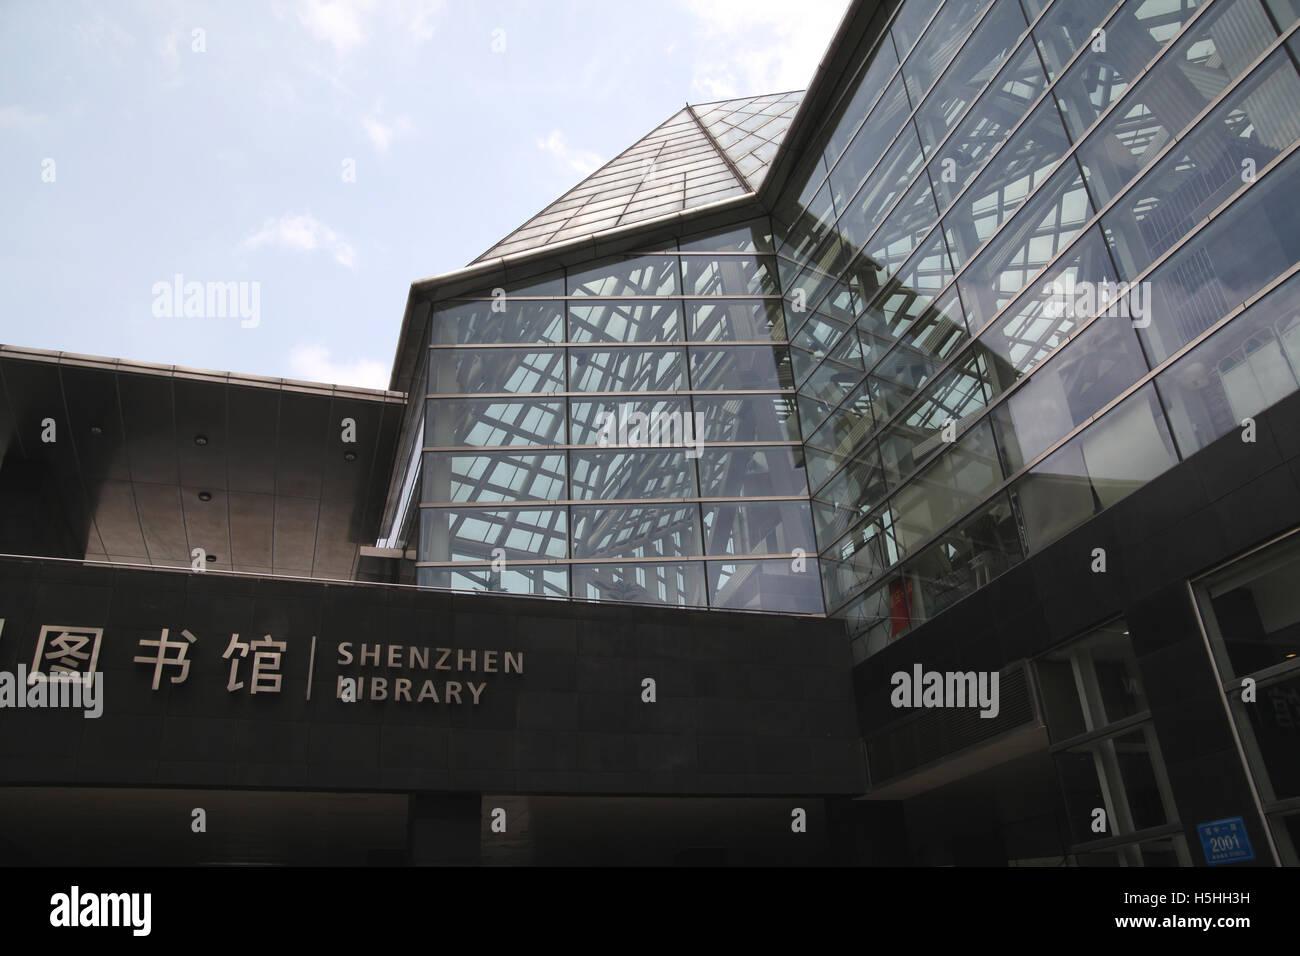 The entrance and glass walls of the Shenzhen Library designed by Arata Isozaki. Shenzhen, China. 05.05.2016. - Stock Image